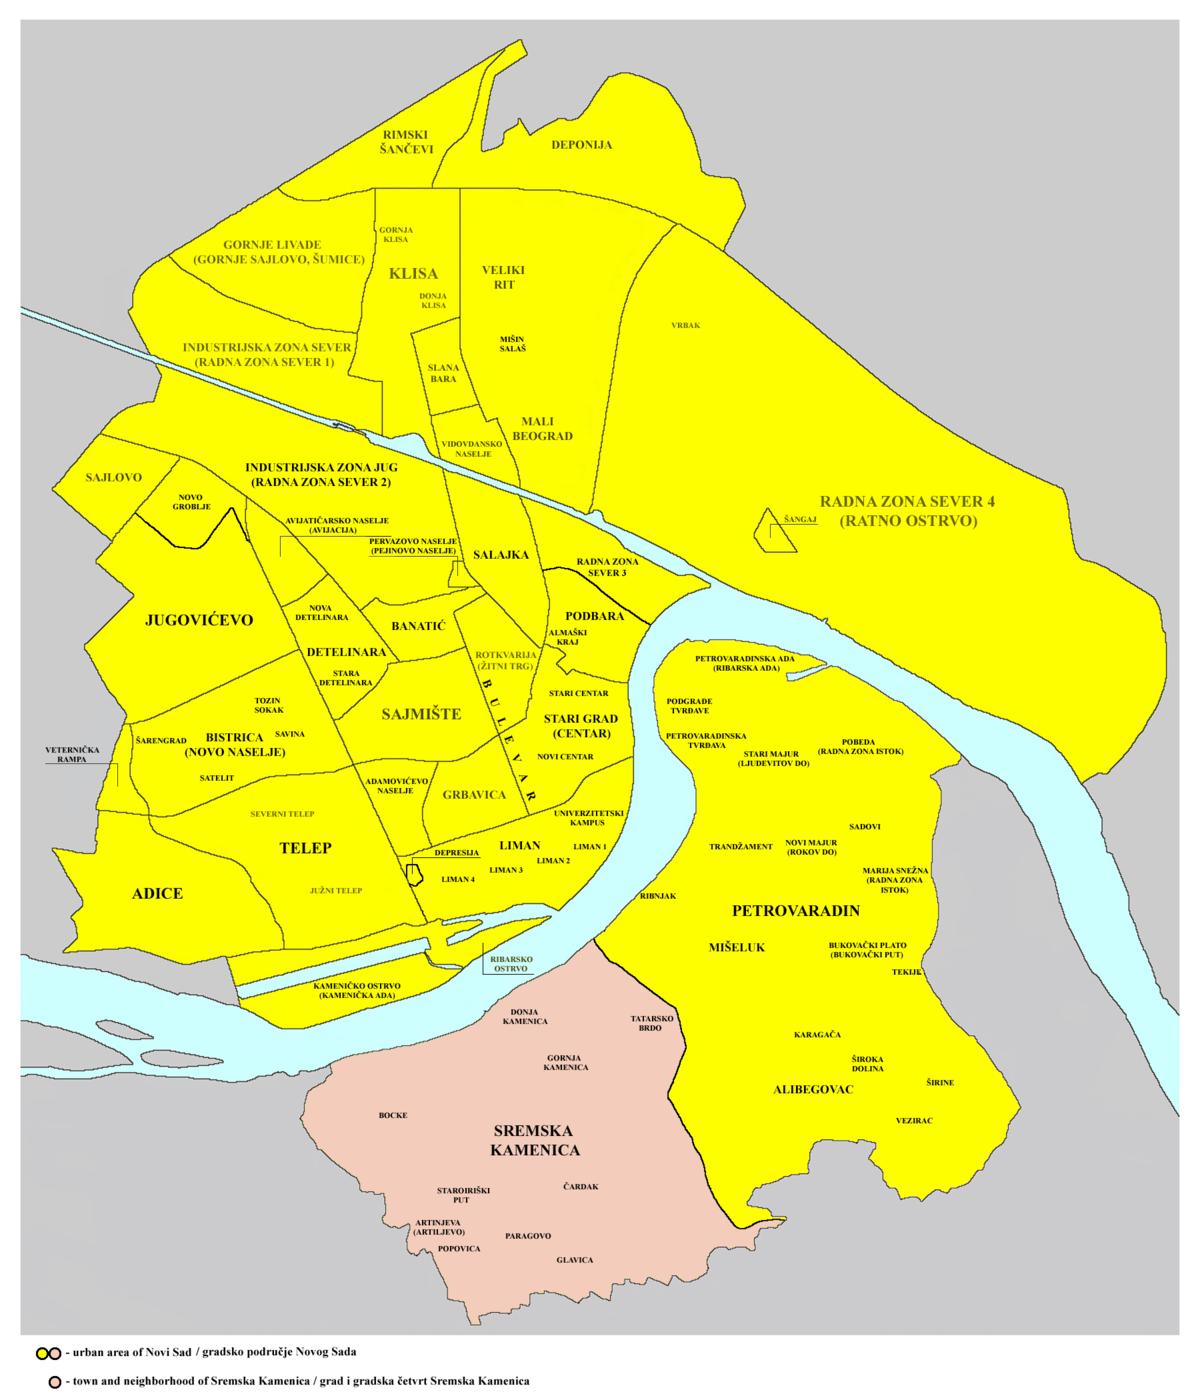 sremska kamenica mapa Čardak, Sremska Kamenica   Wikipedia sremska kamenica mapa